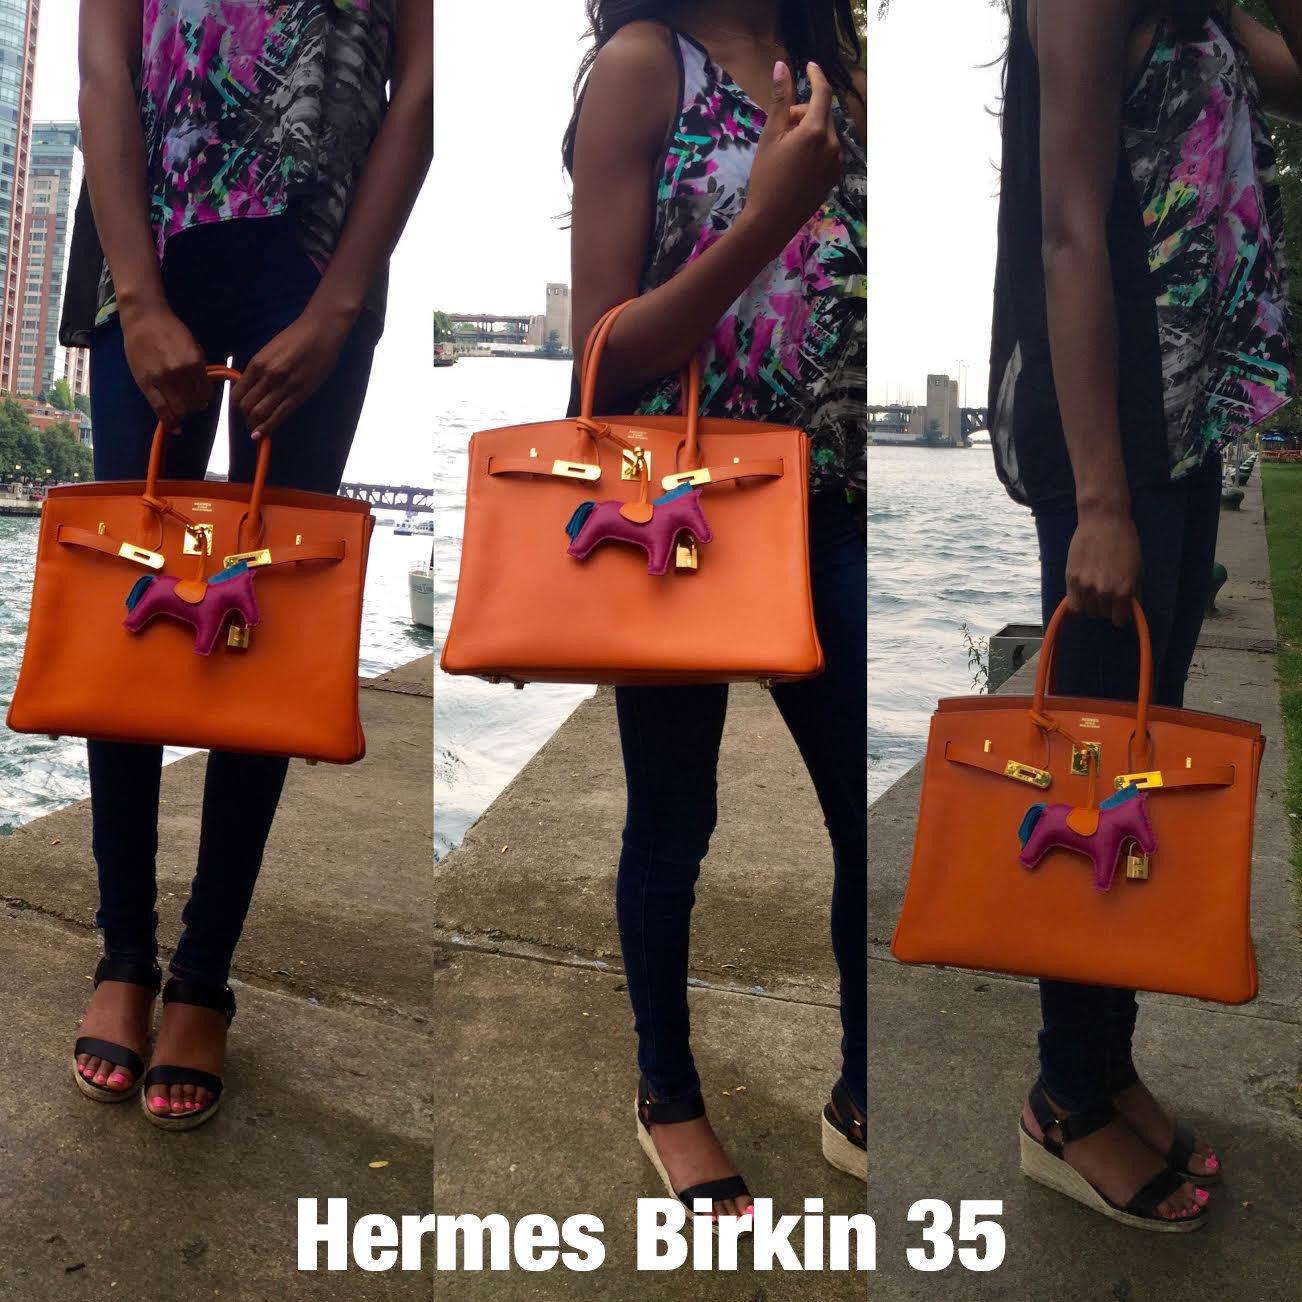 17a6cccf38 Hermes Birkin Size Comparison - PurseBop